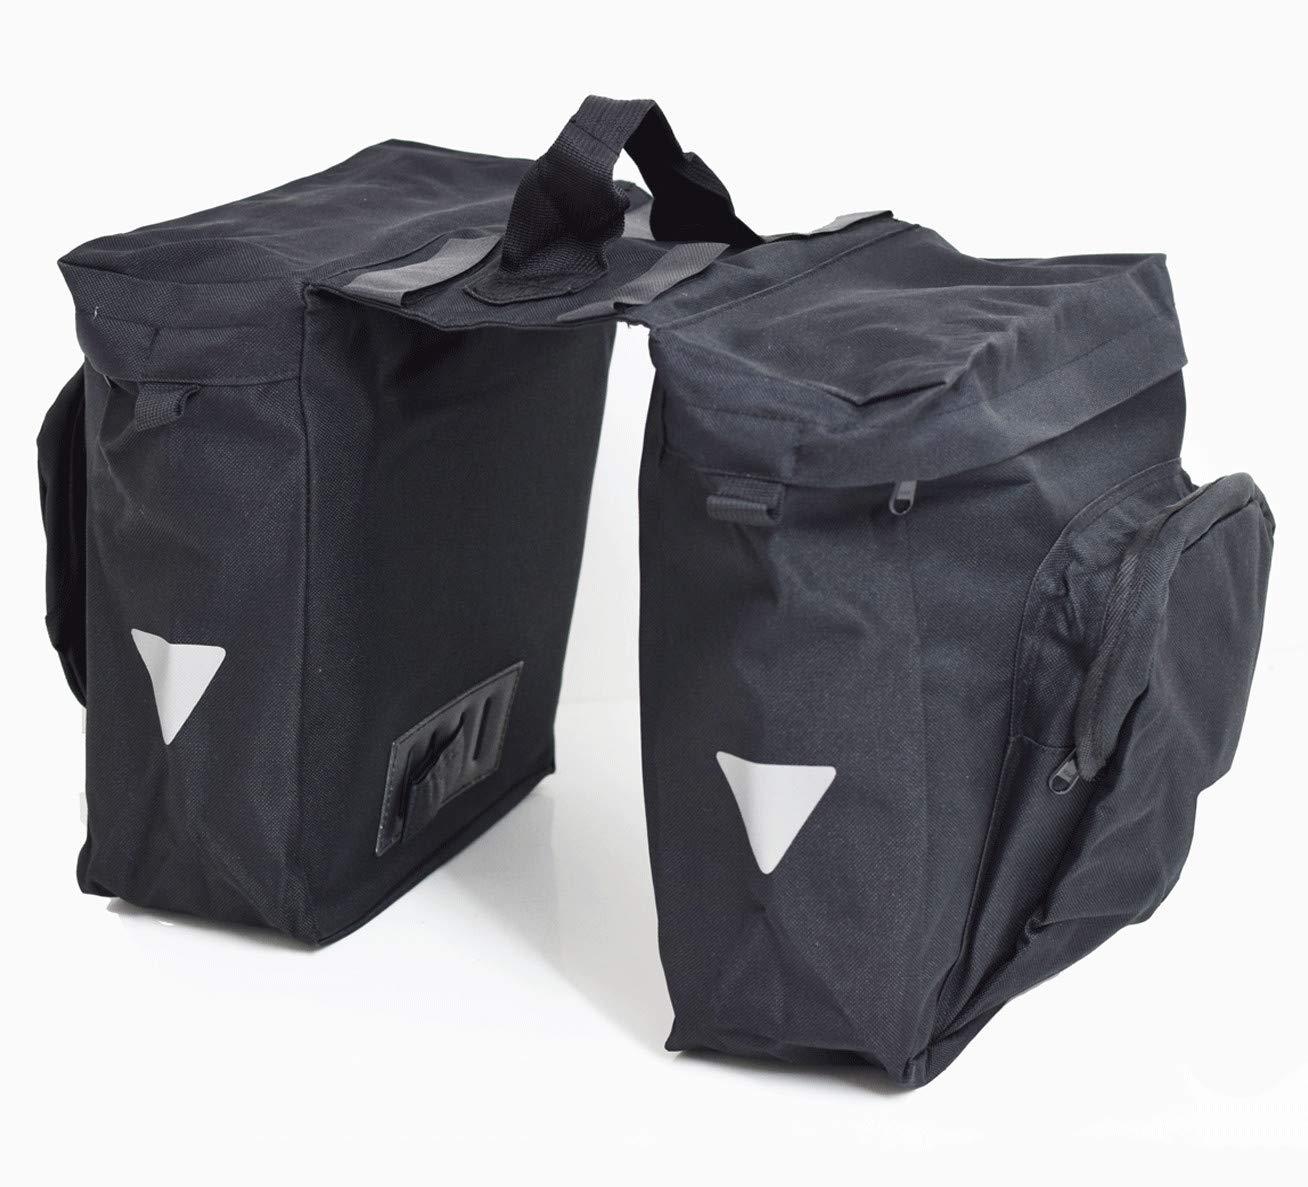 Savage PB14C Bike Bag for Luggage Rack (2-fold), Black